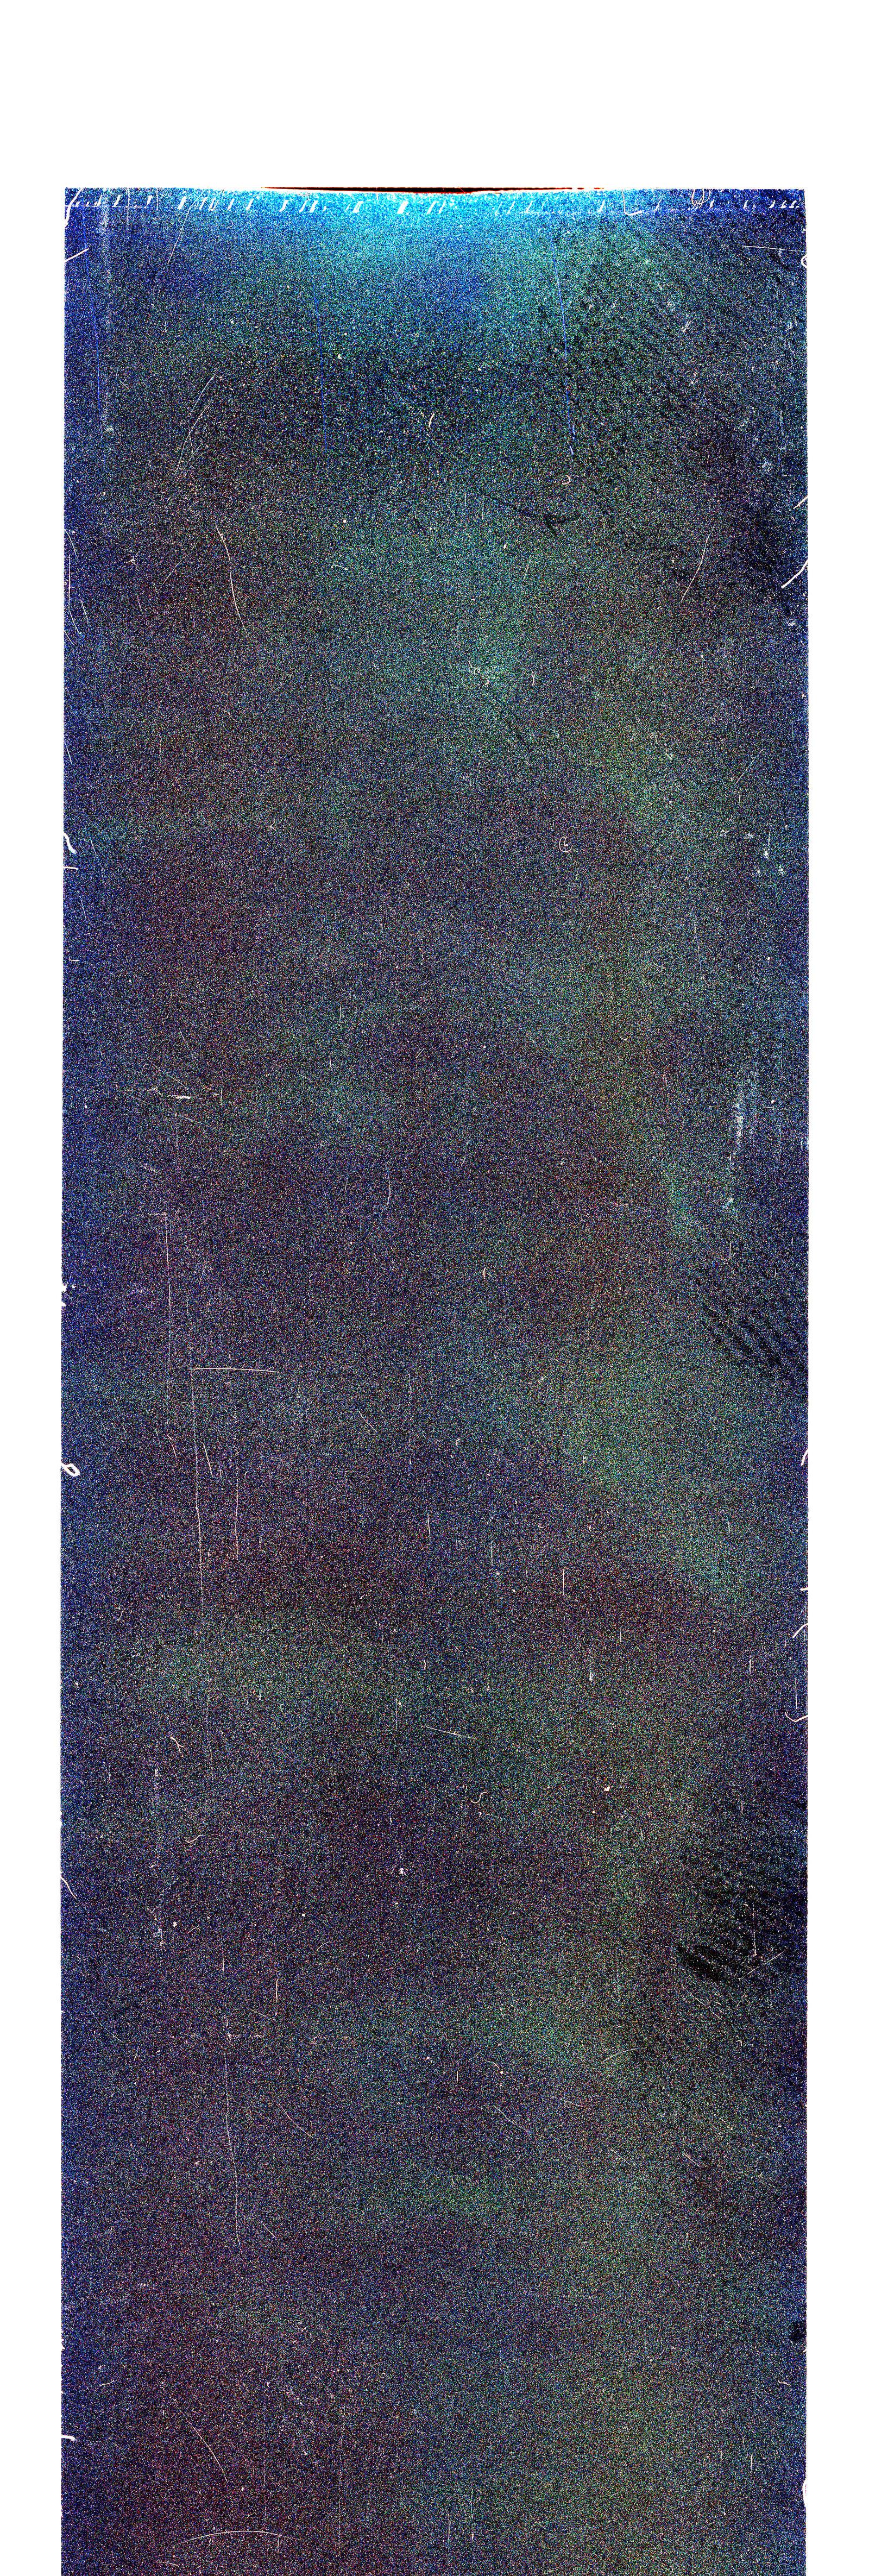 Texture 12 by edredon